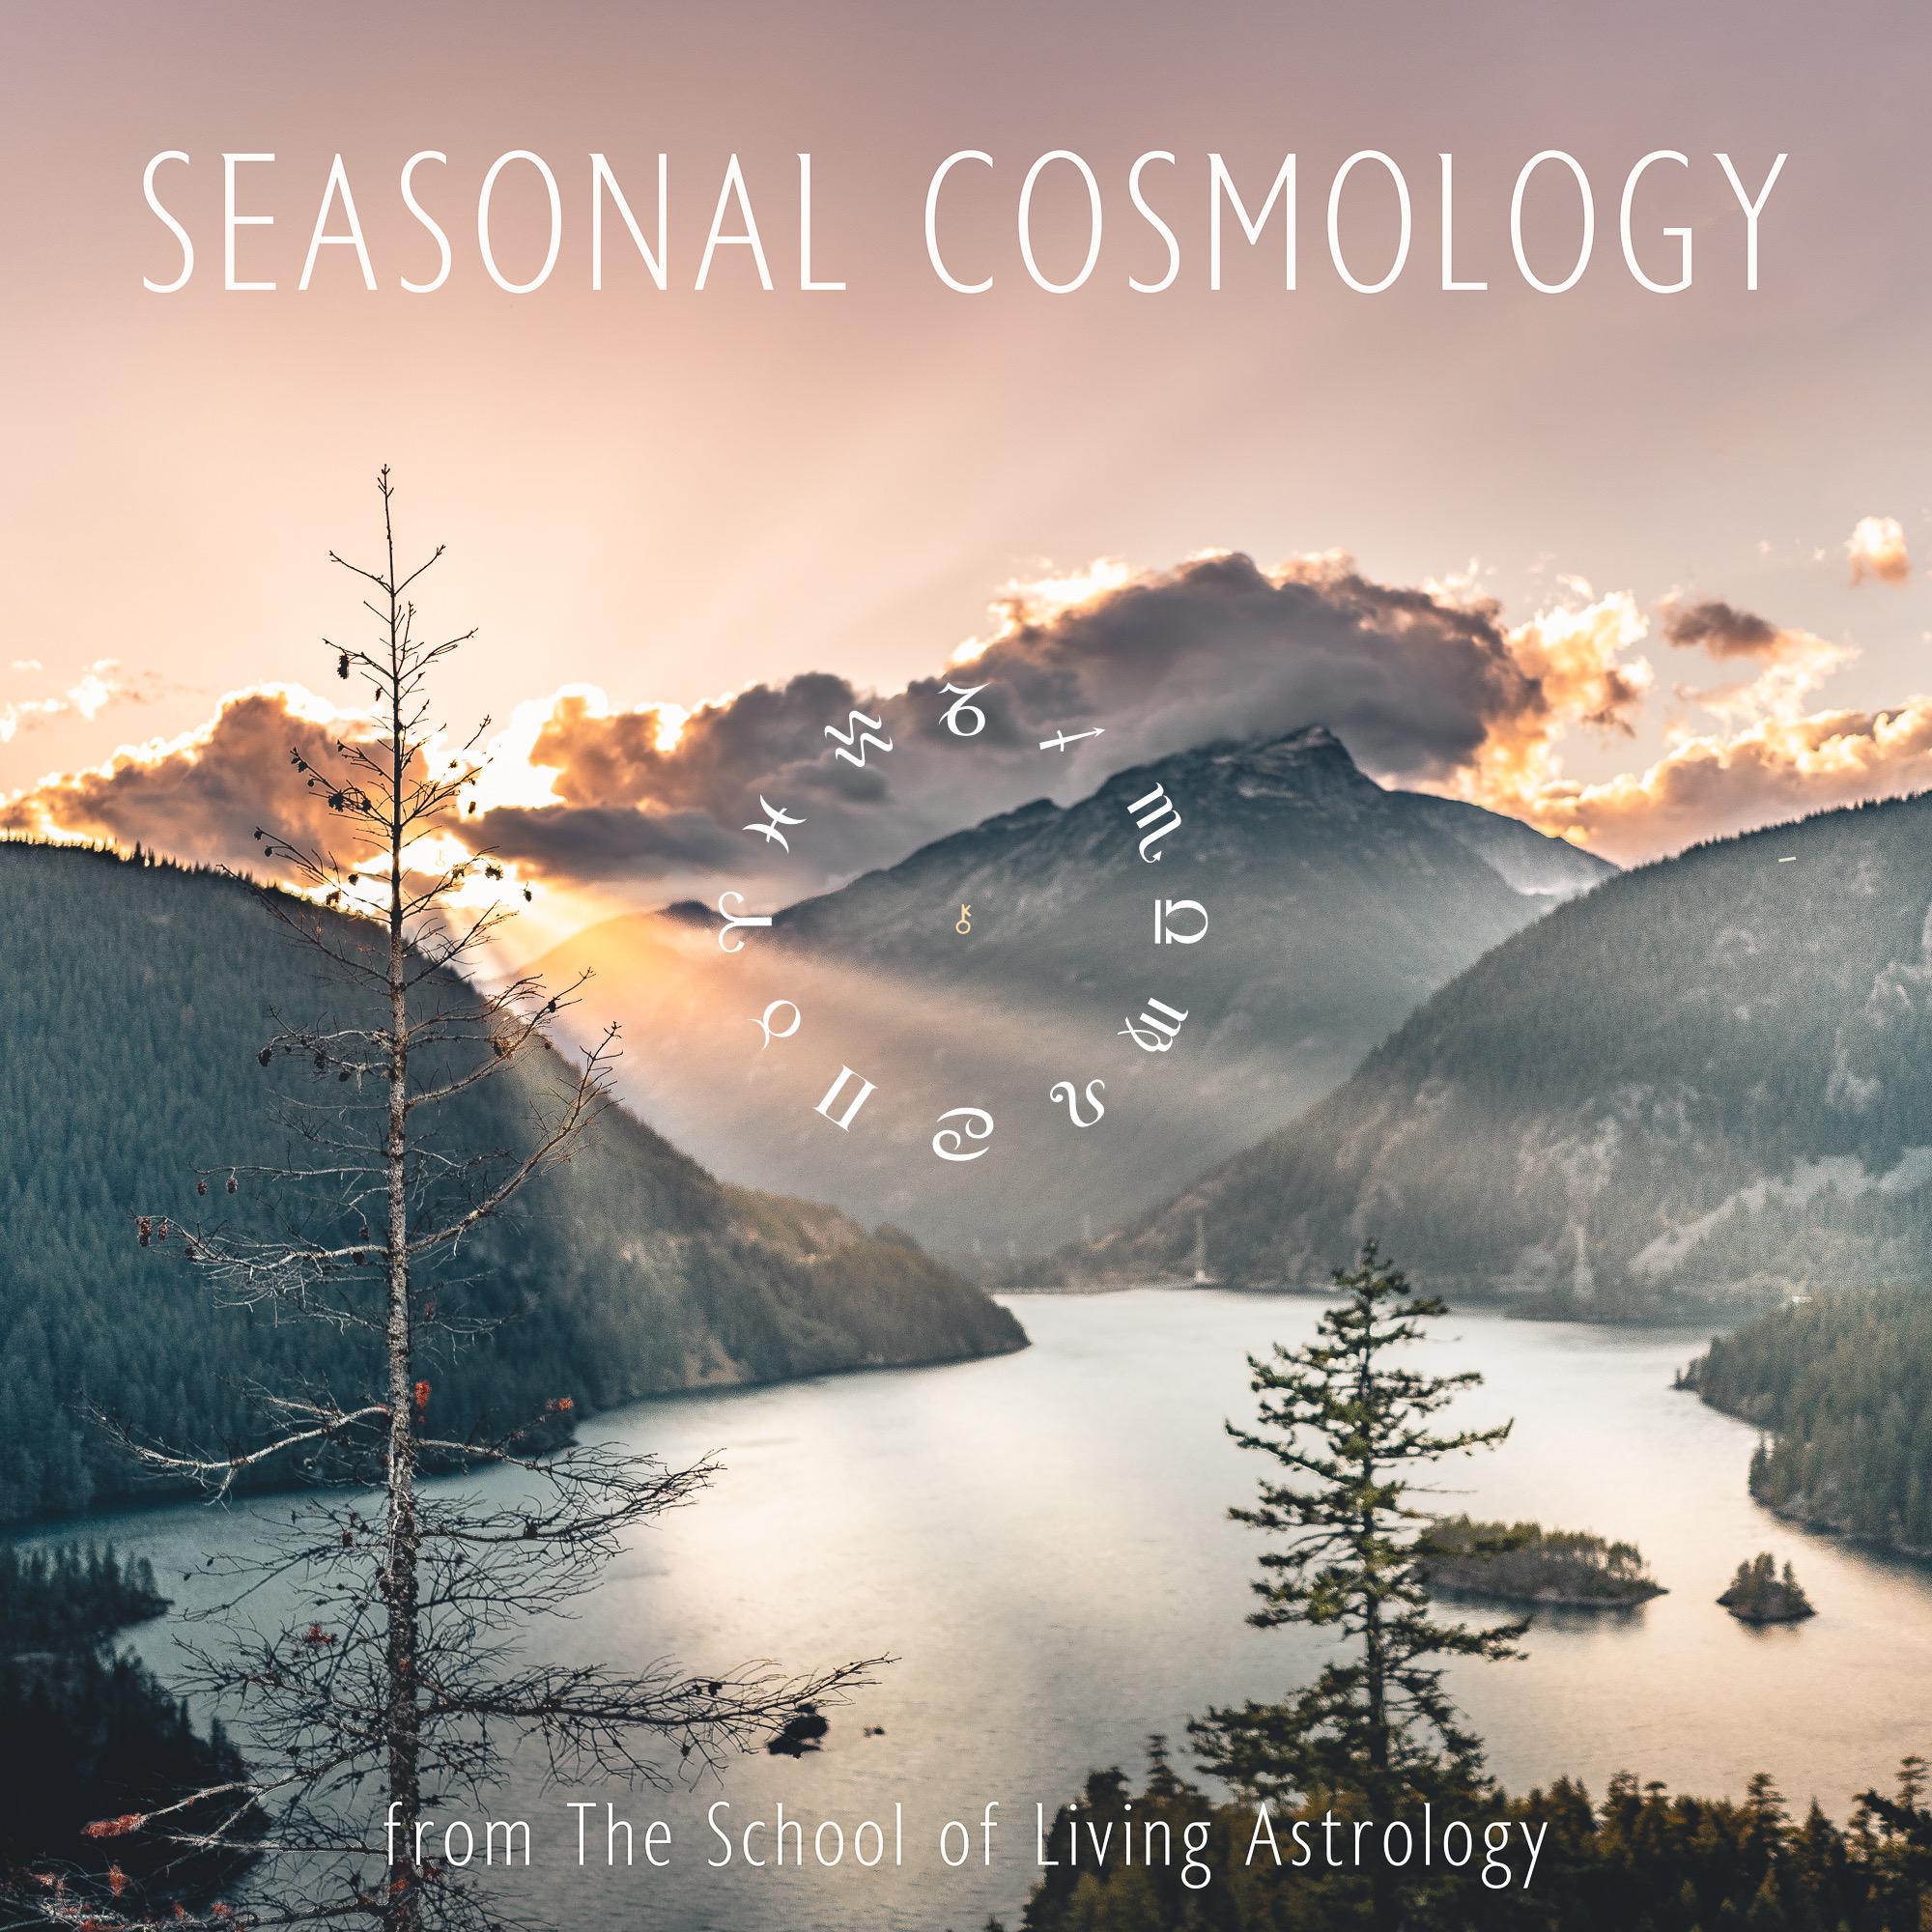 Seasonal Cosmology - The Chironium & The School Of Living Astrology